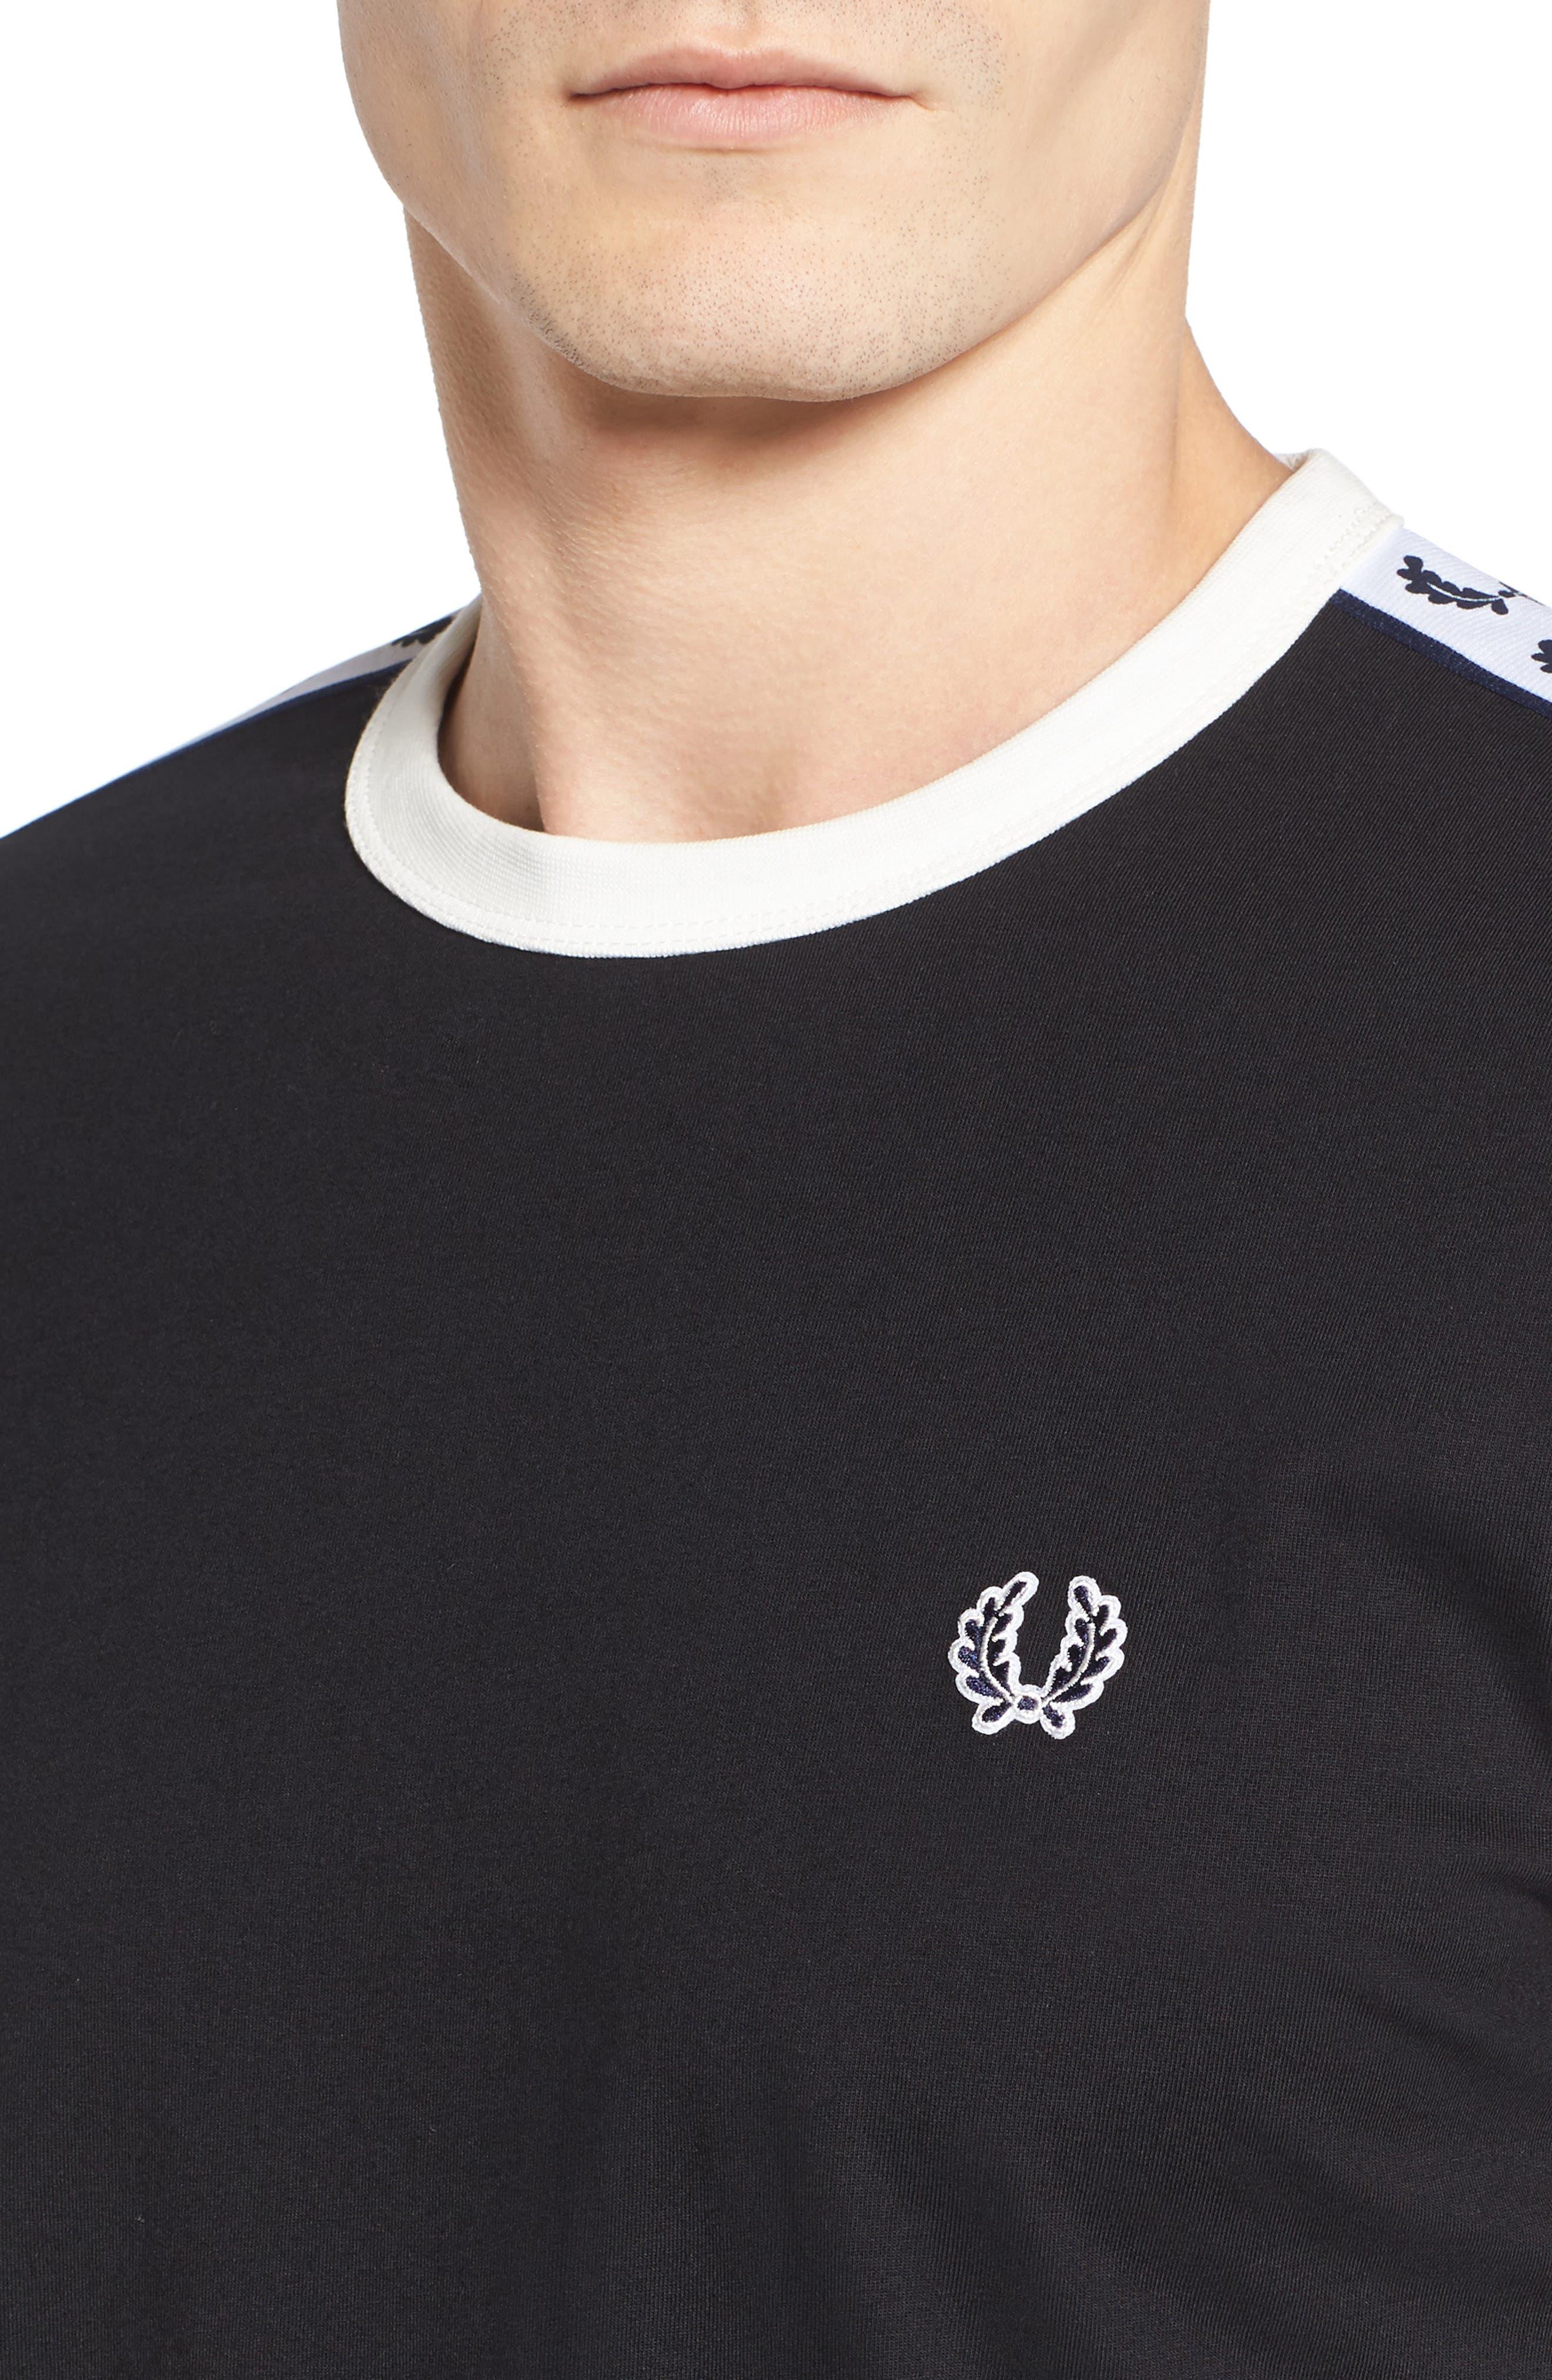 Extra Trim Fit Cotton Ringer T-Shirt,                             Alternate thumbnail 24, color,